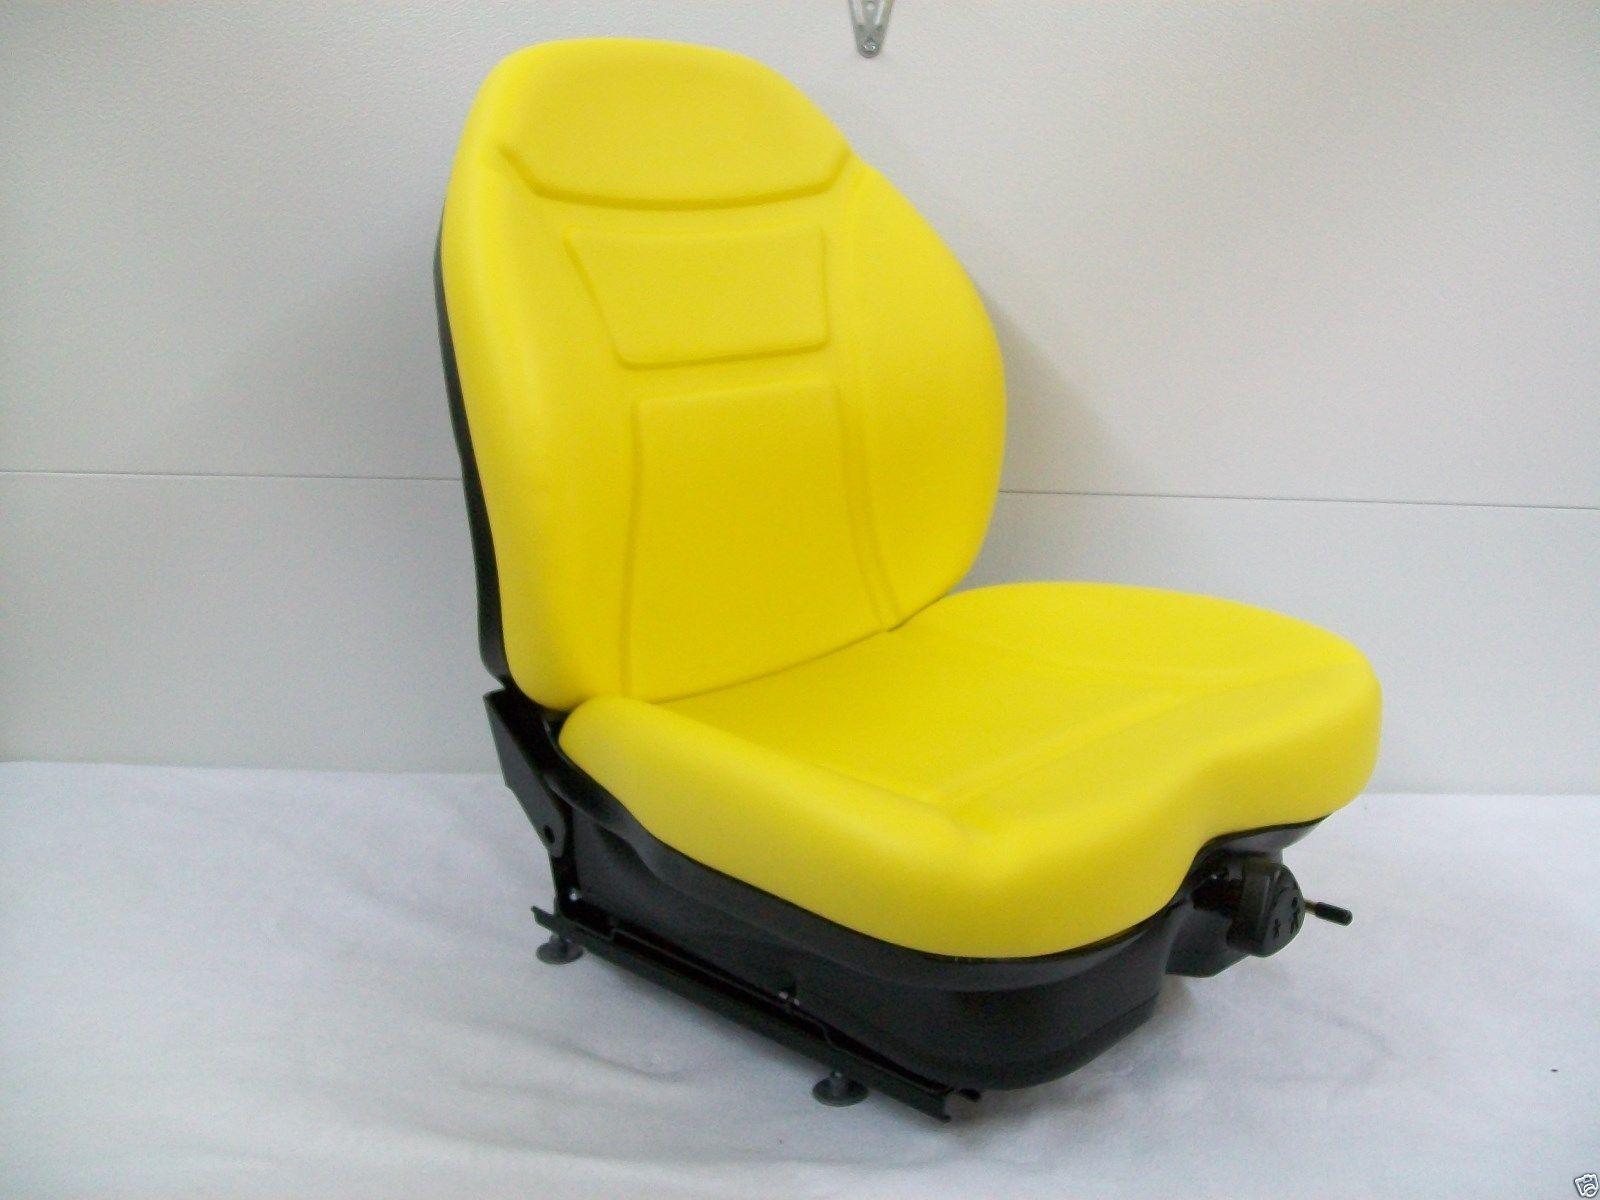 YELLOW SUSPENSION SEAT JD JOHN DEERE FRONT MOWER ZERO TURN GREENS